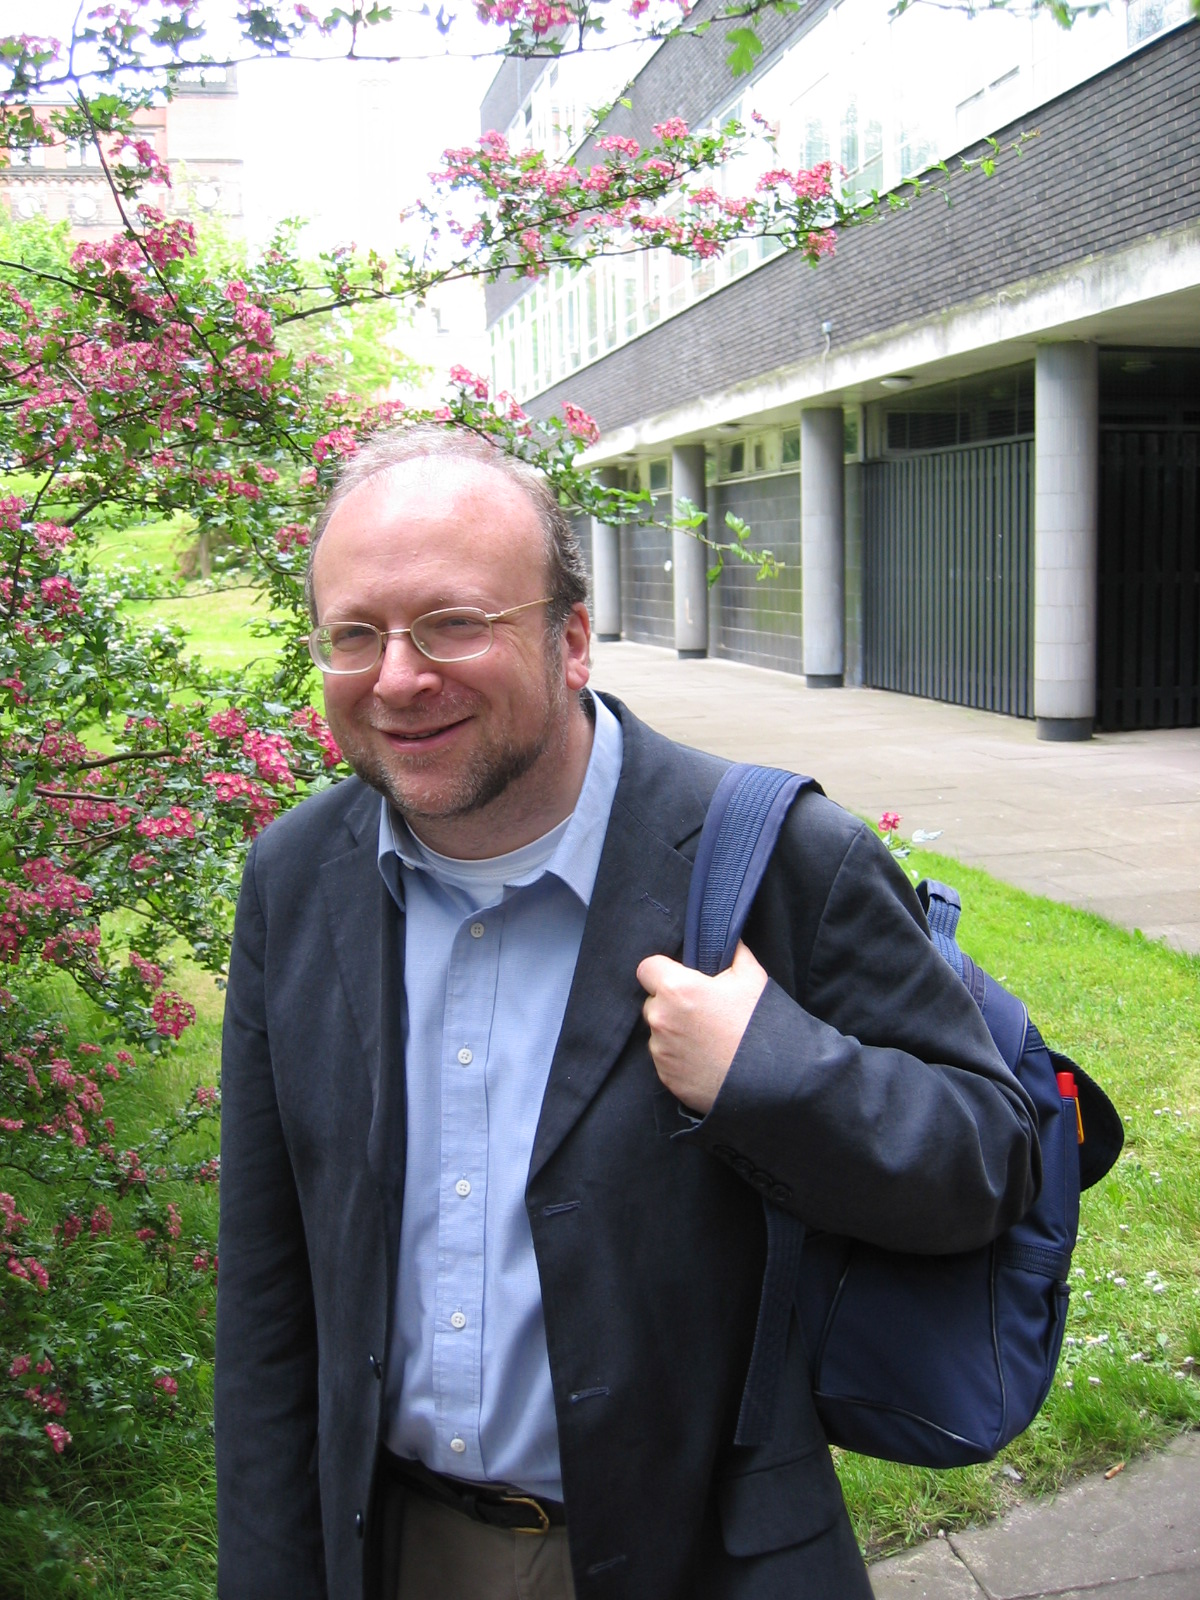 Computer Science Cambridge Student Room